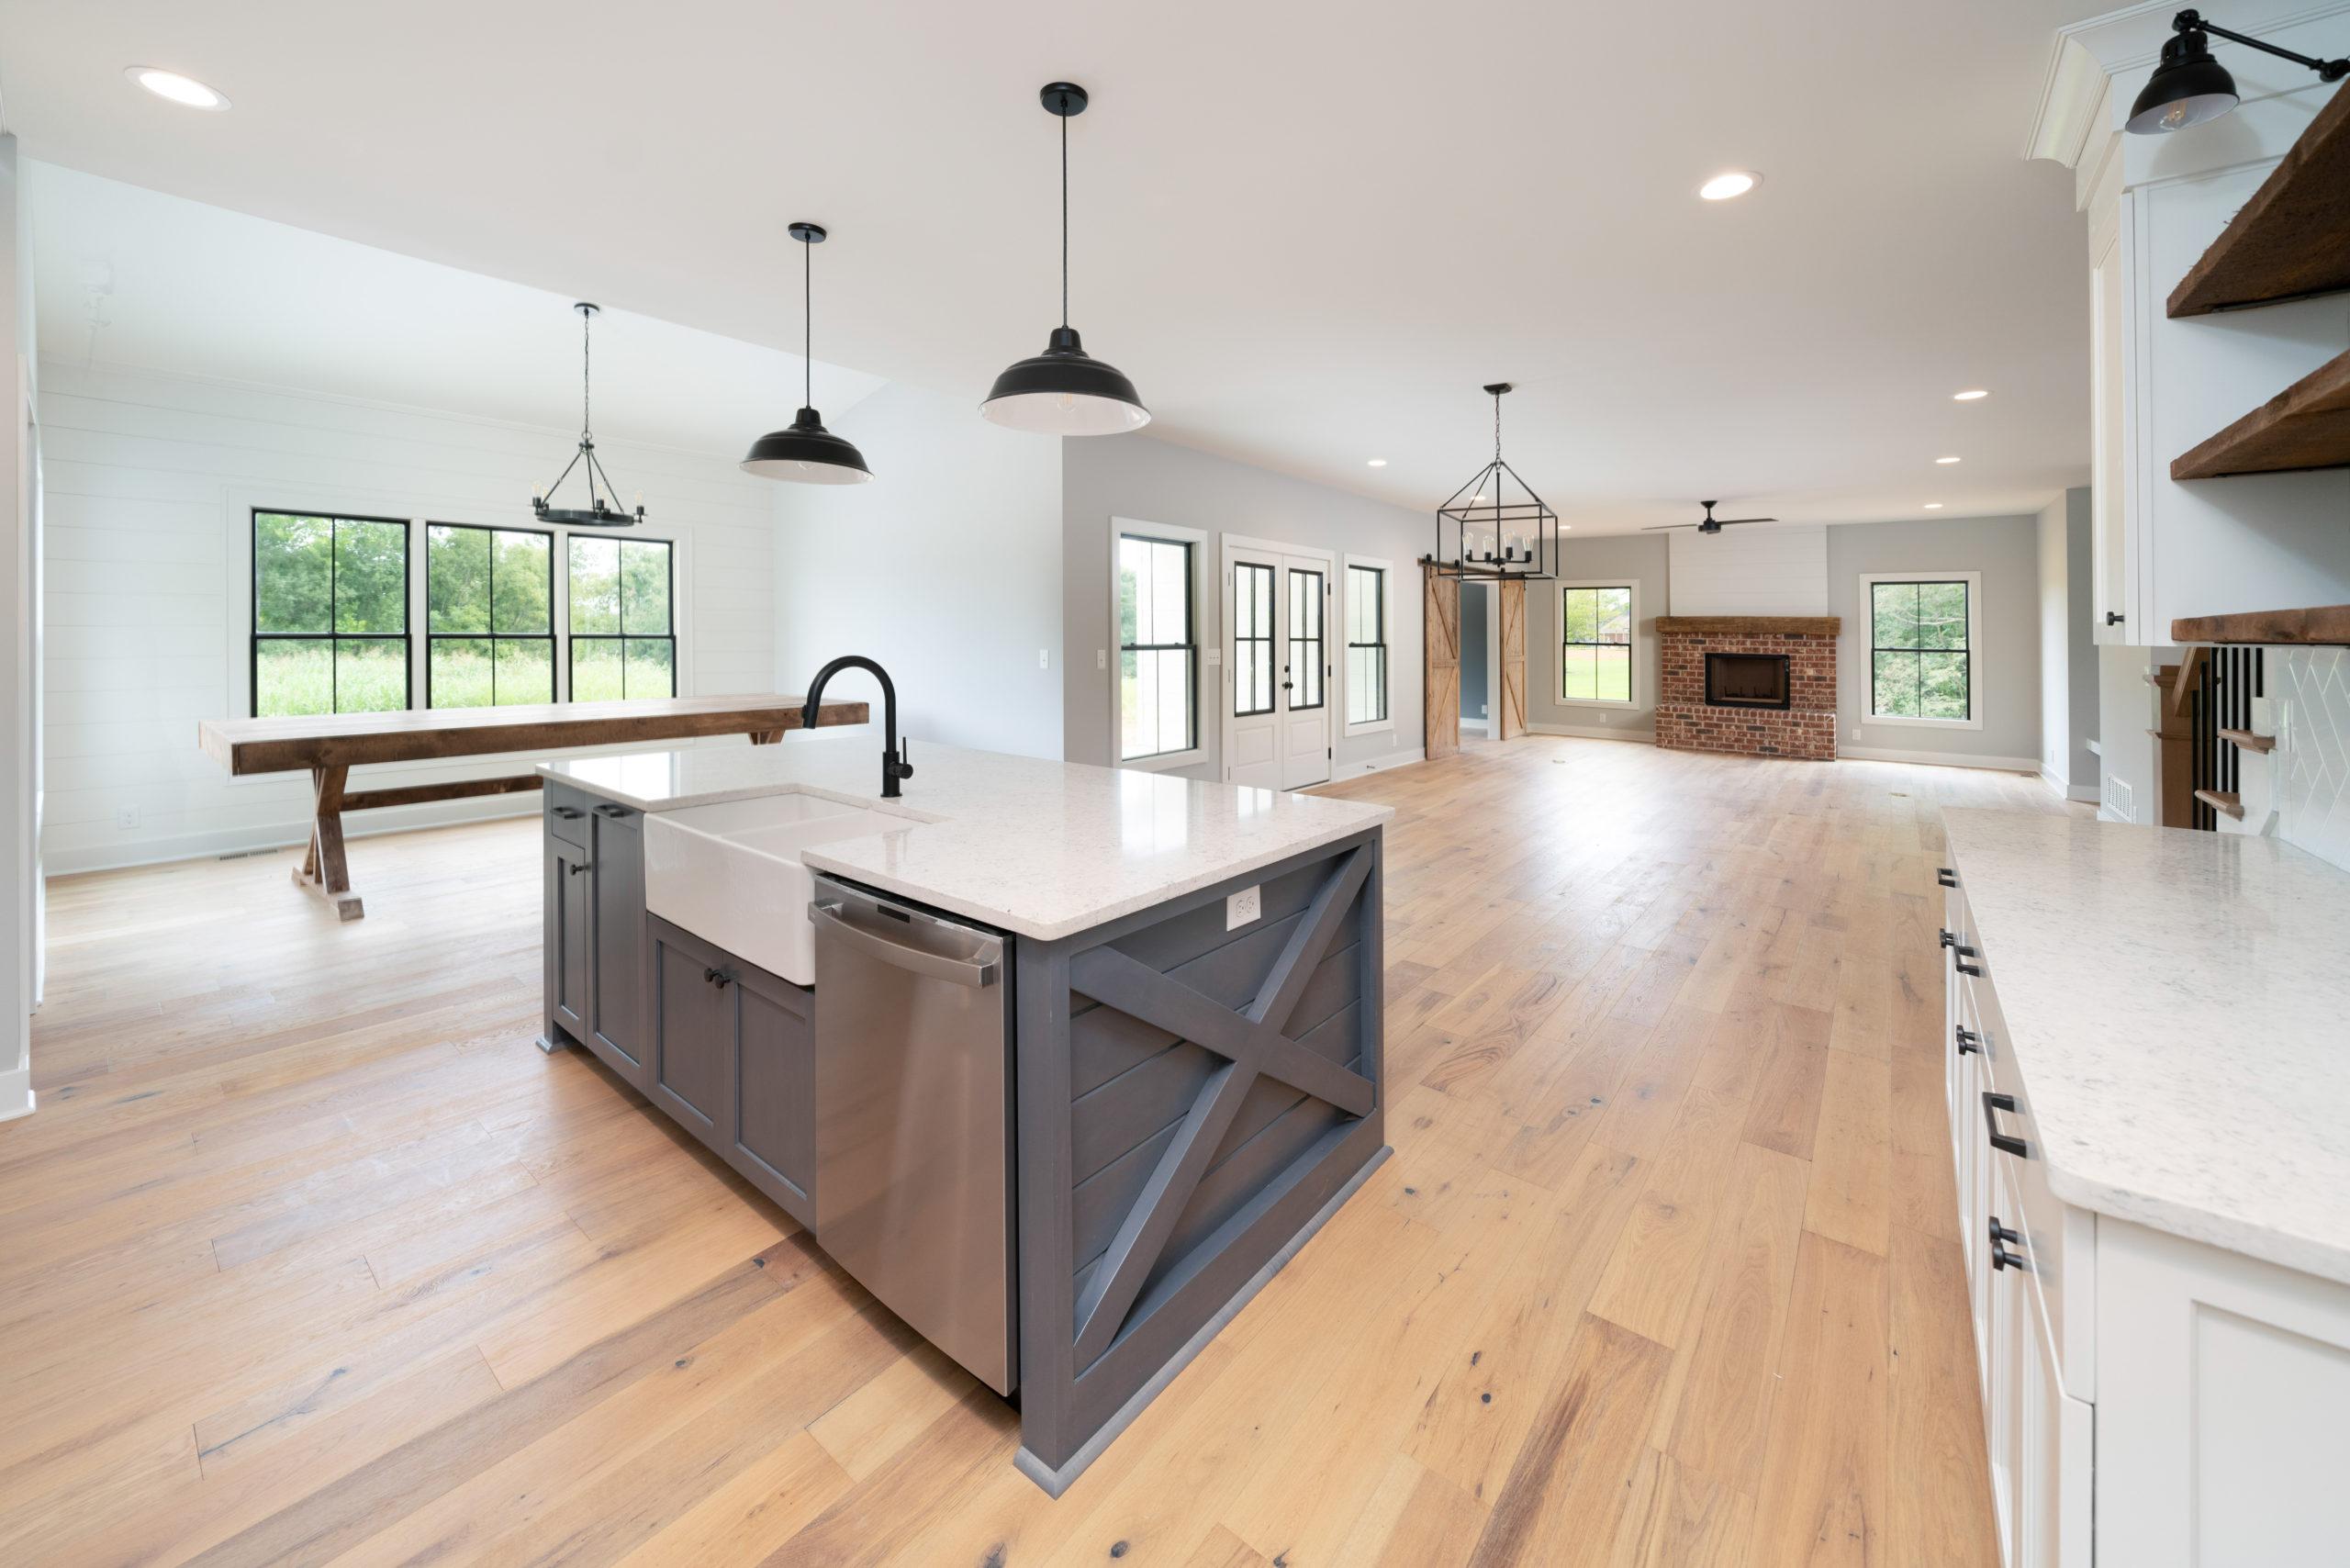 farmhouse style sink on gray kitchen island